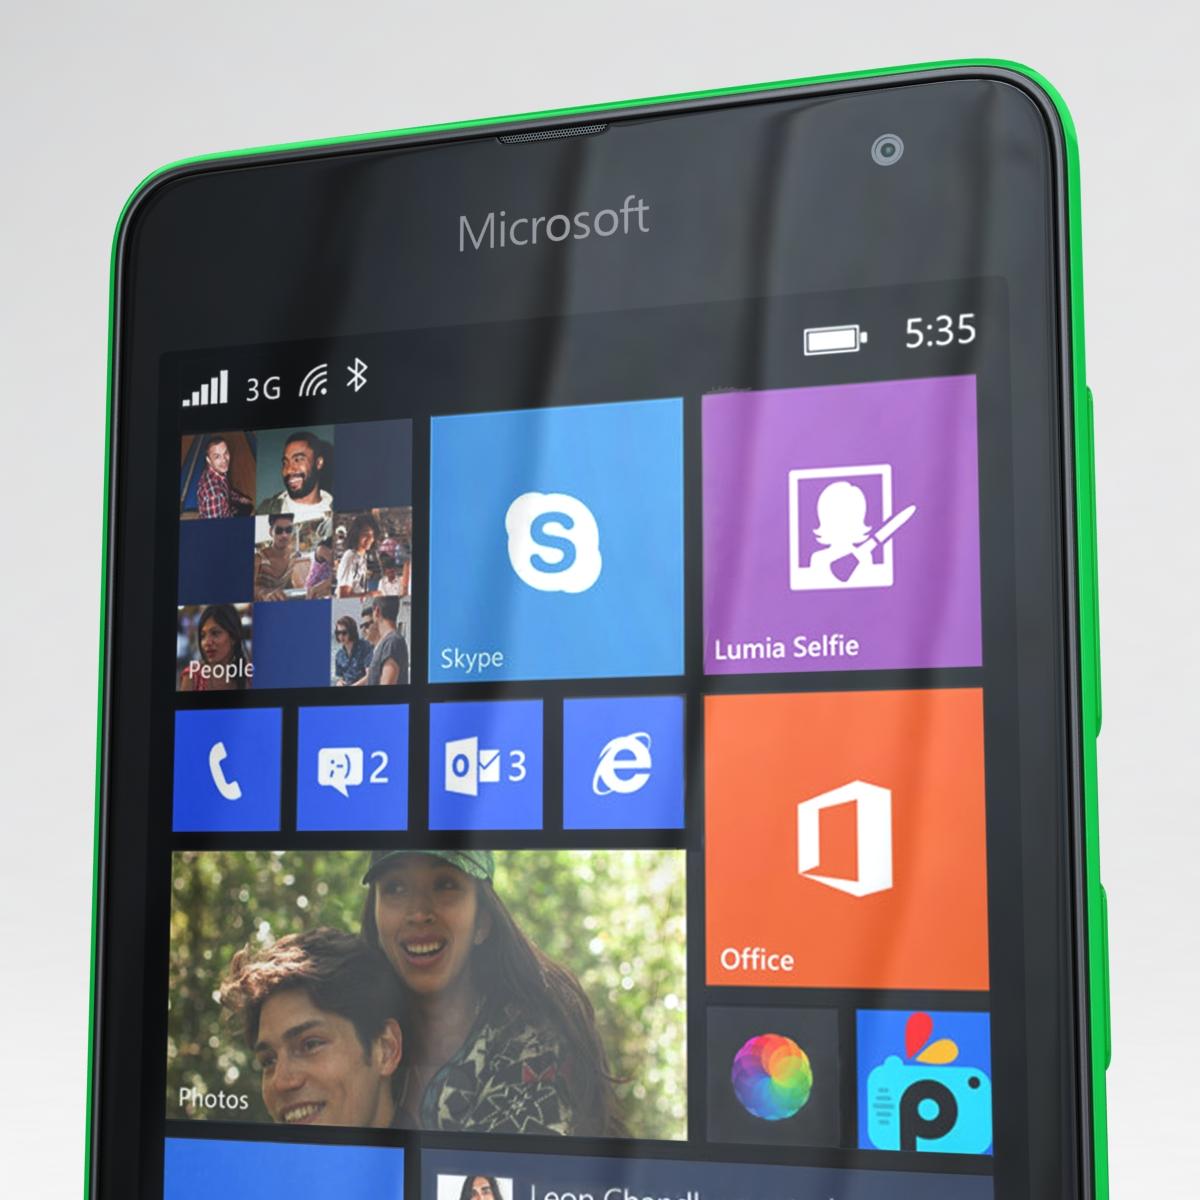 microsoft lumia 535 and dual sim green 3d model 3ds max fbx c4d obj 204185